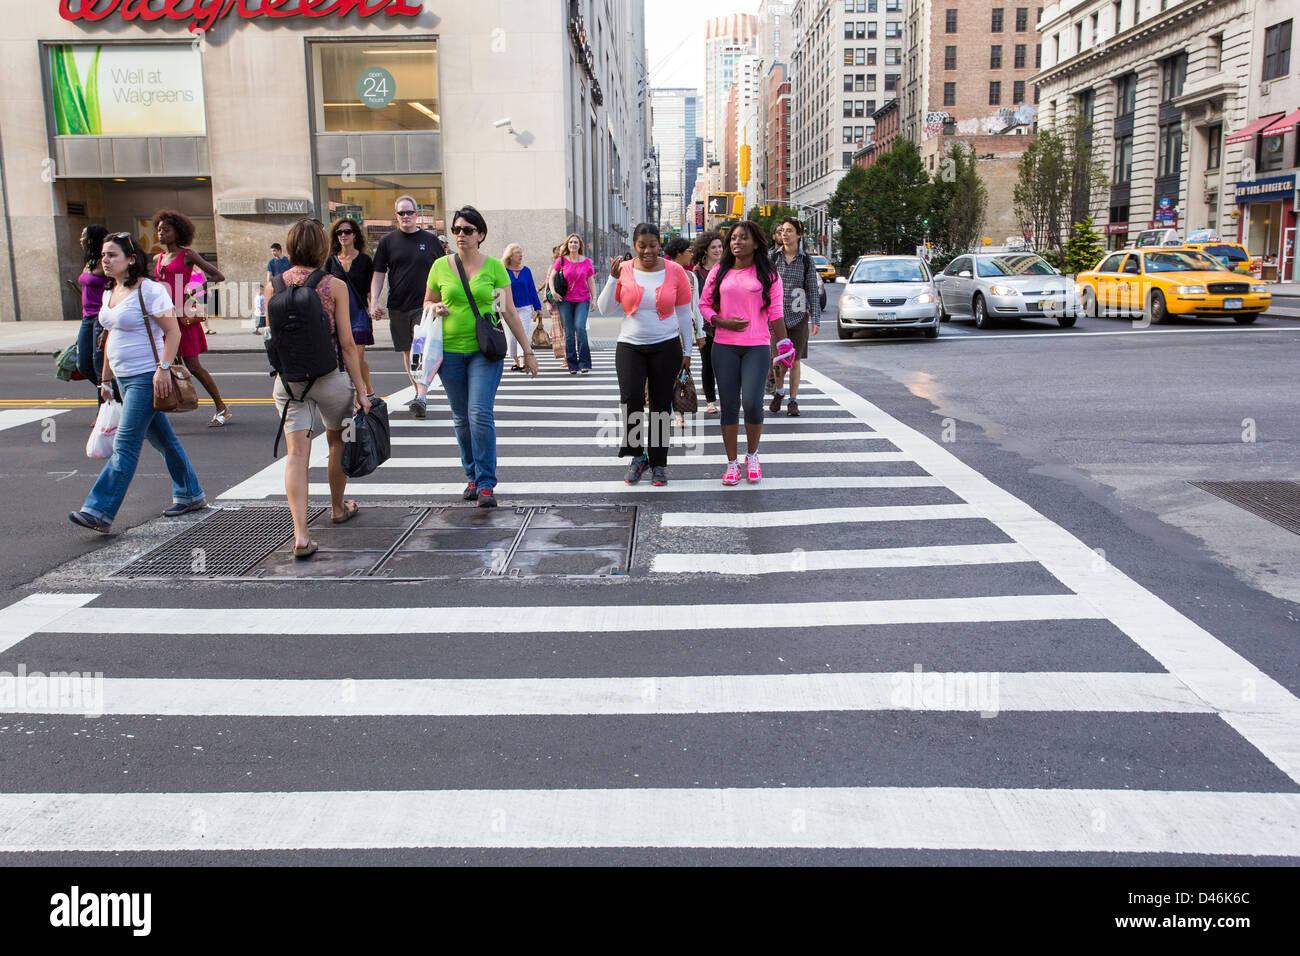 People crossing a street using a crosswalk in New York ...